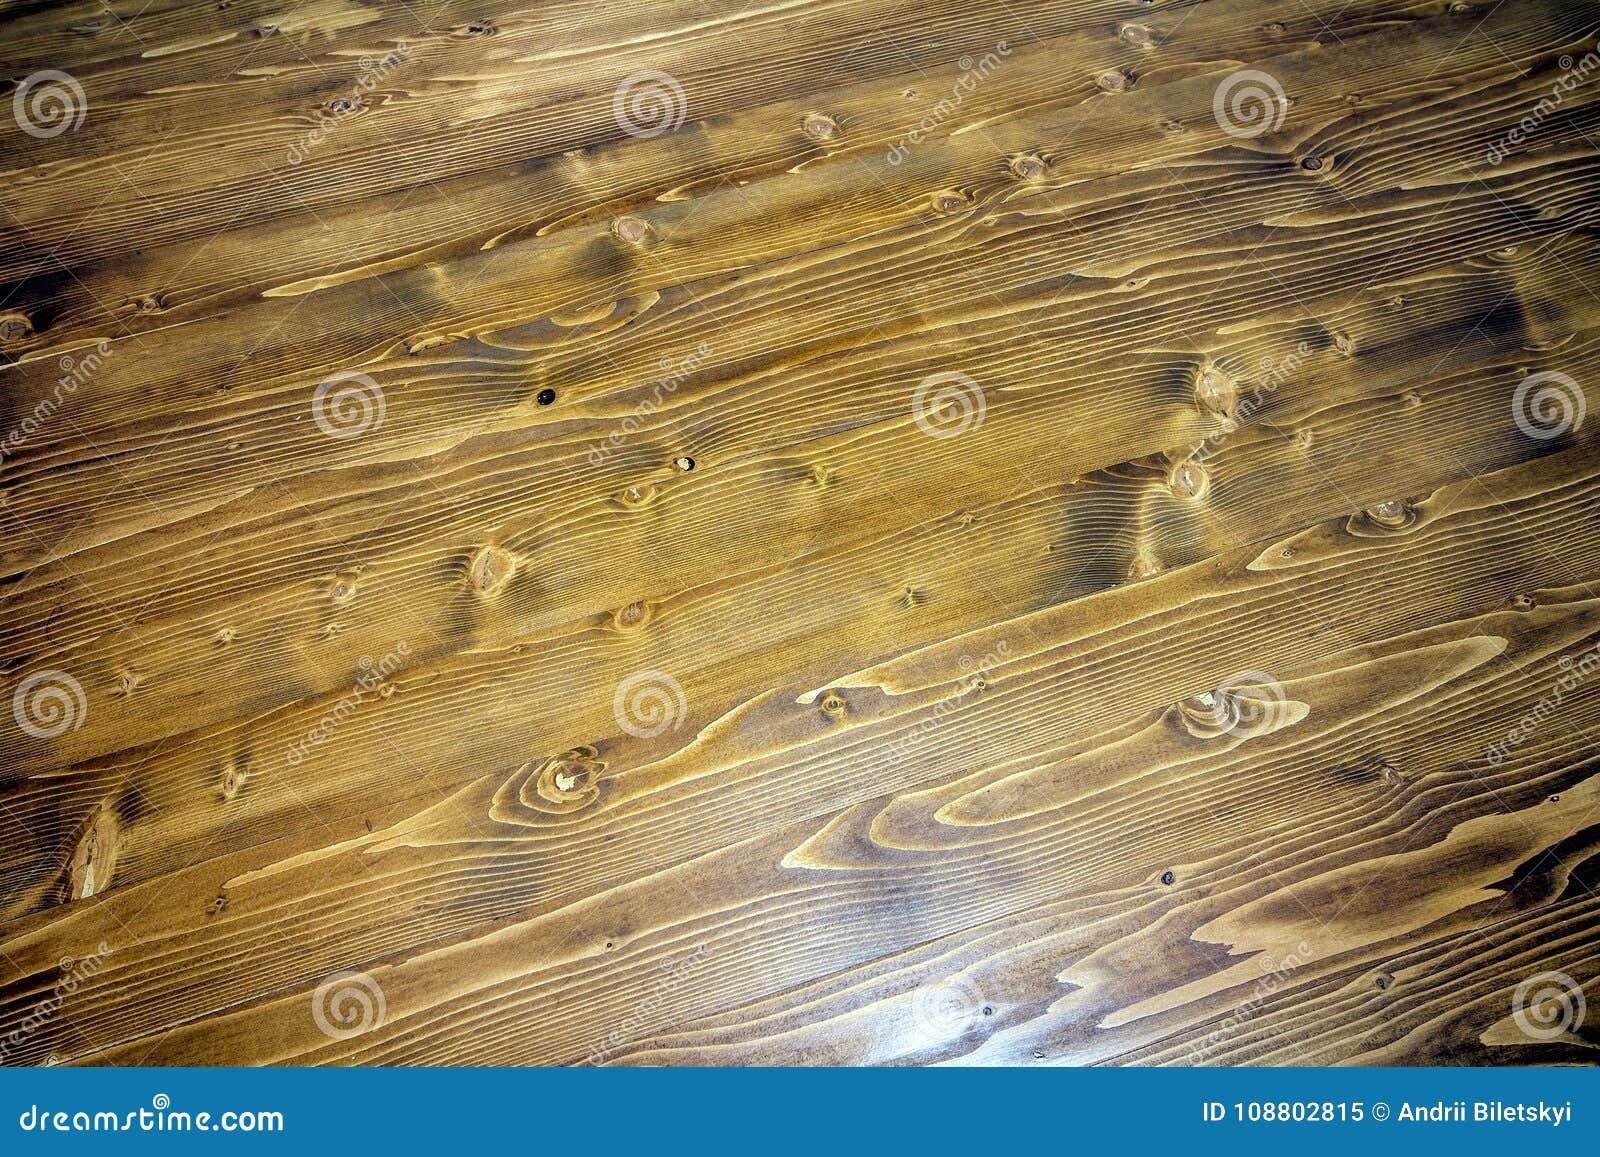 Seamless oak laminate parquet floor texture background.